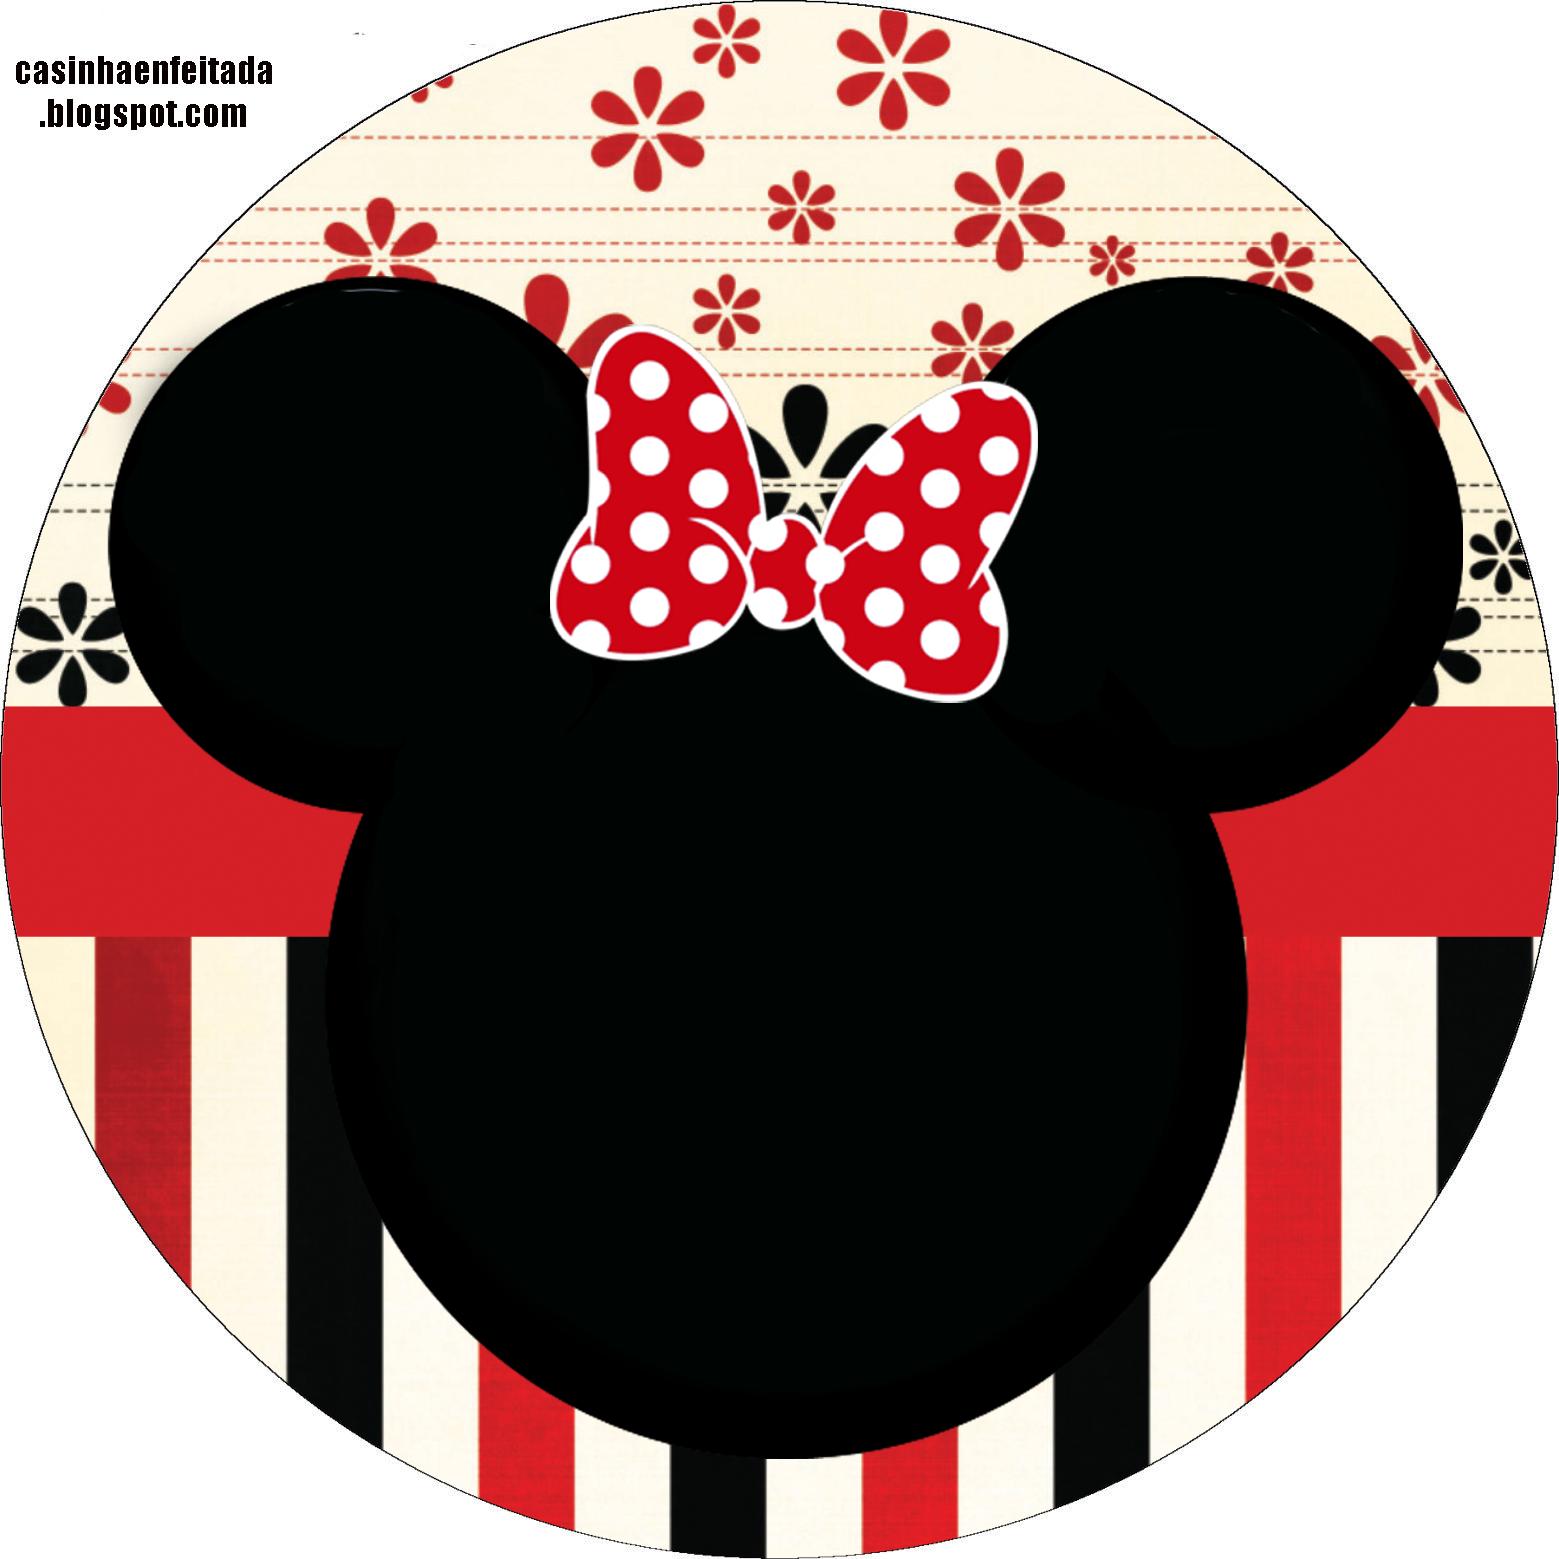 Artesanato Suely Mooca ~ Kit Festa Minnie Vermelha Para Imprimir Grátis Minnie vermelha, Kit festa e Imprimir